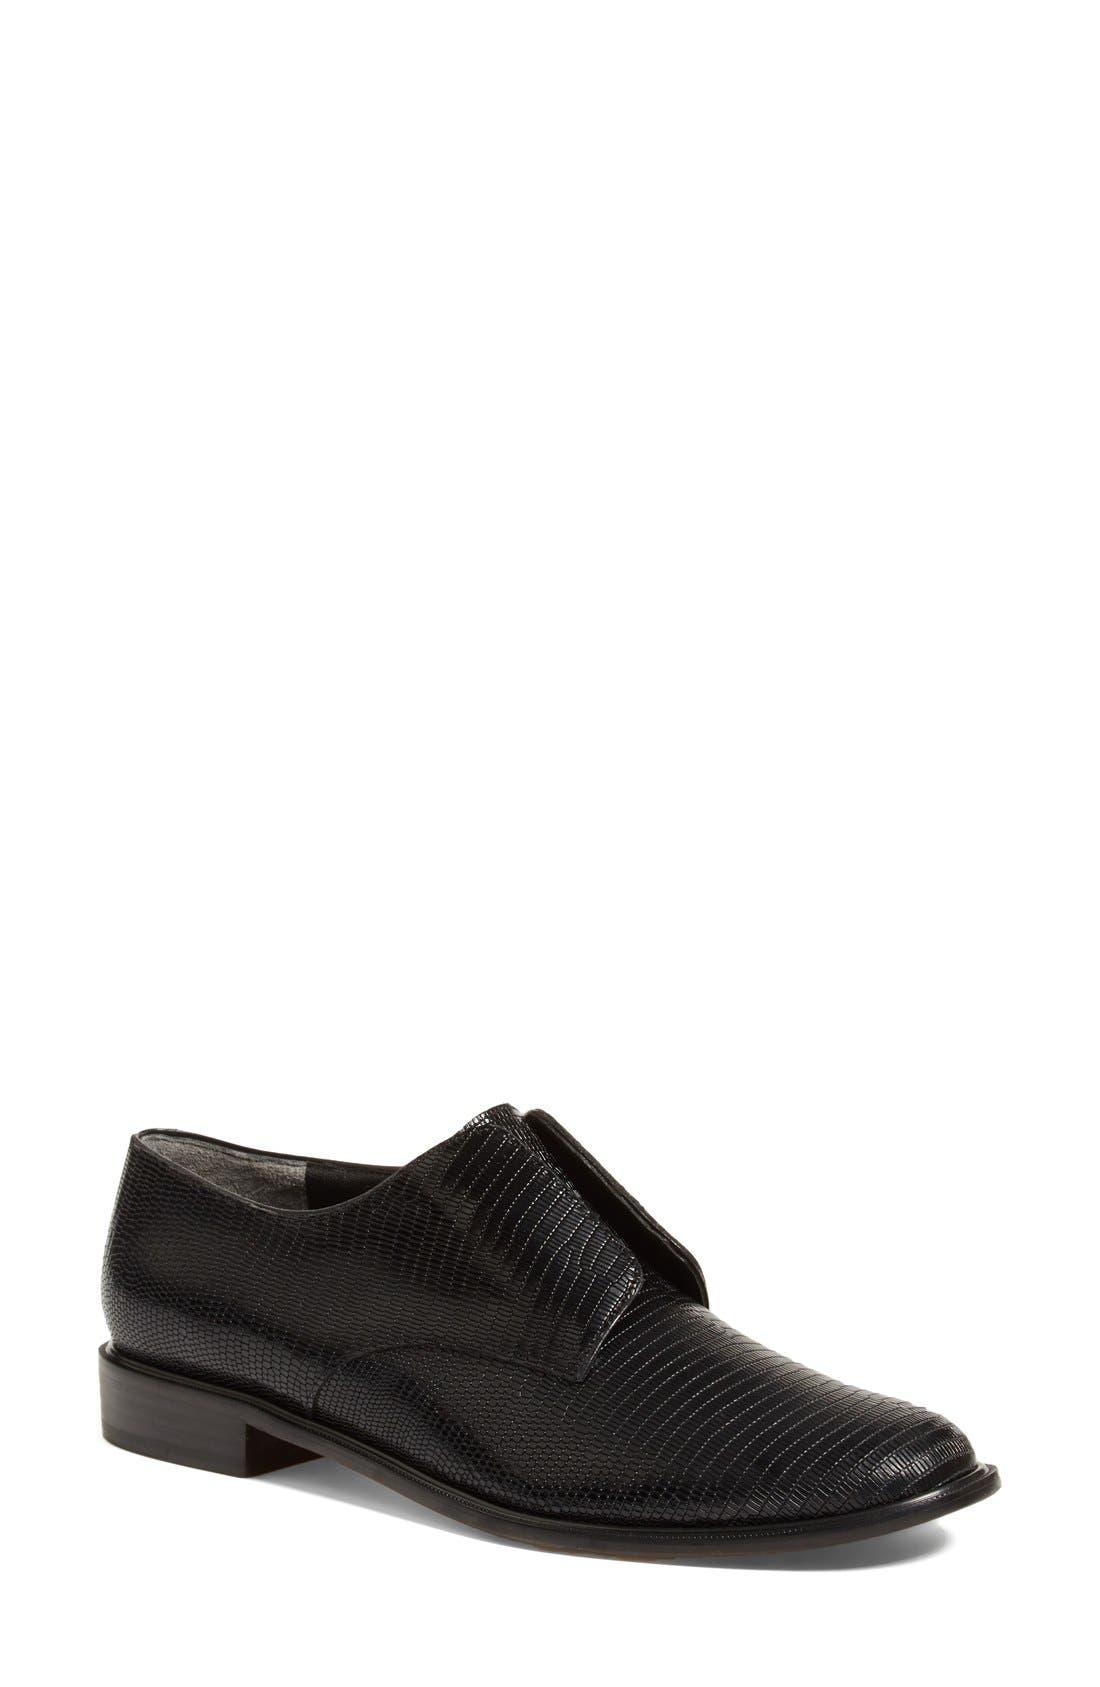 'Jamo' Slip-On Oxford,                             Main thumbnail 1, color,                             Black Leather